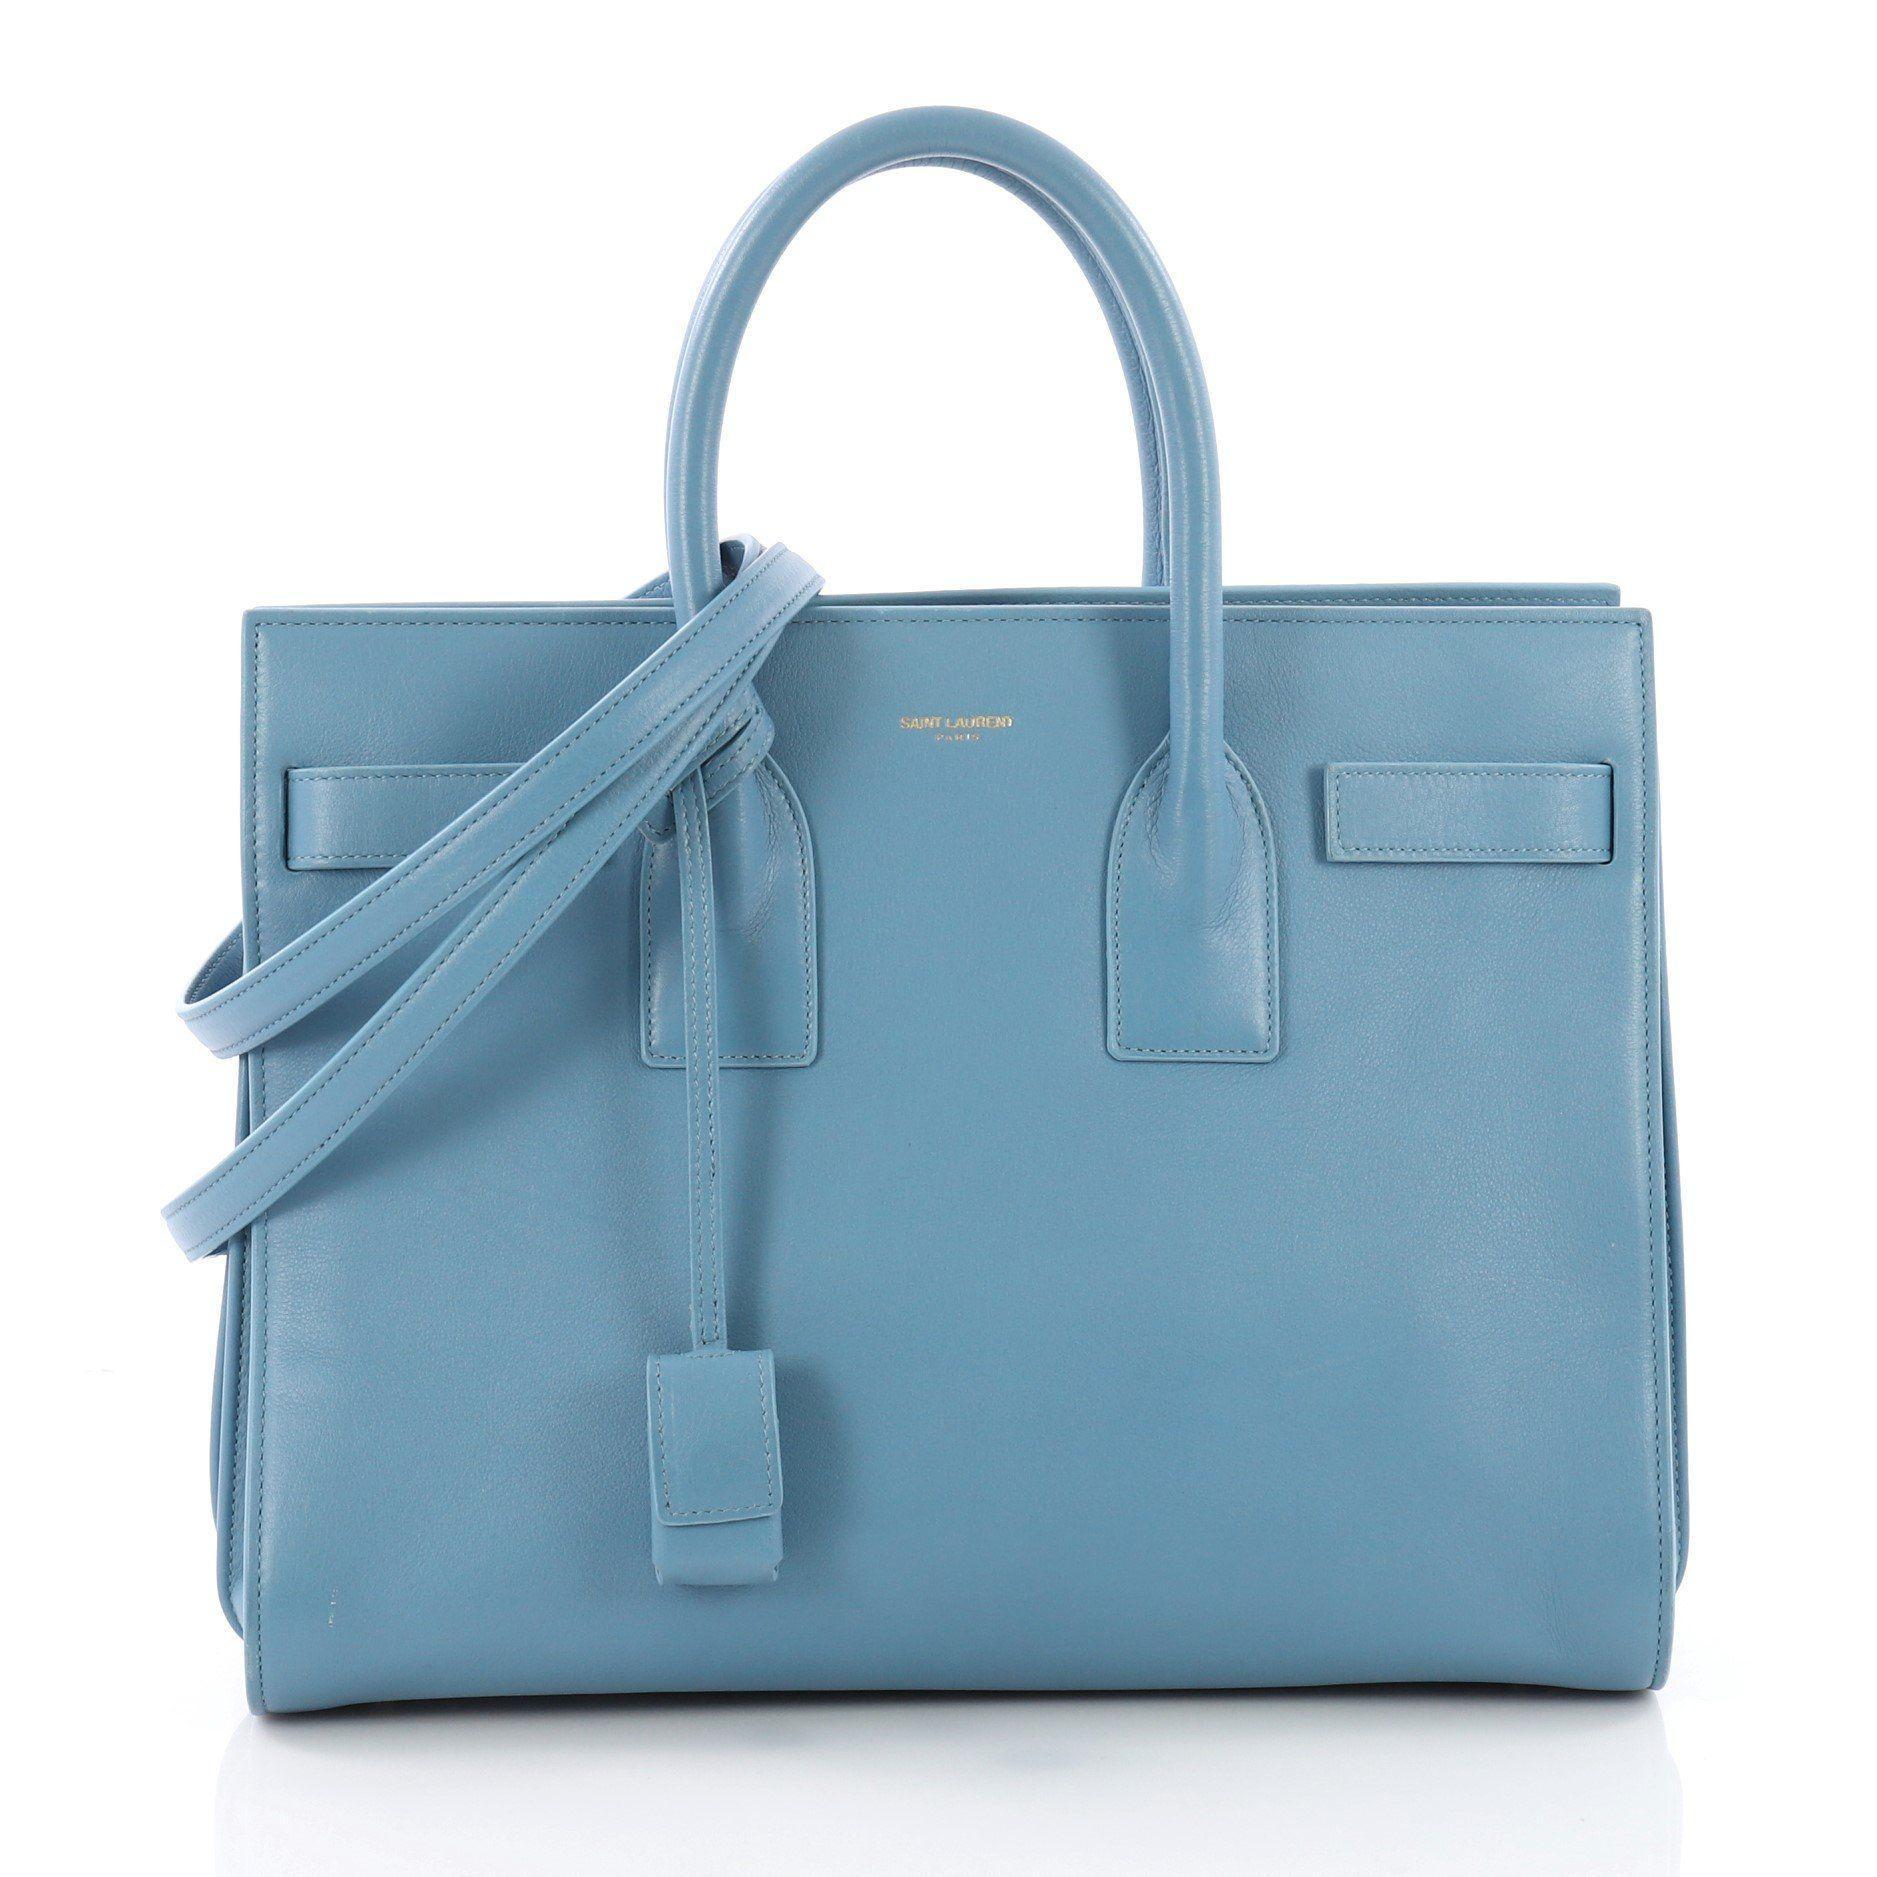 f1353e7f32e3 saint-laurent--Pre-Owned-Sac-De-Jour-Handbag-Leather-Small.jpeg